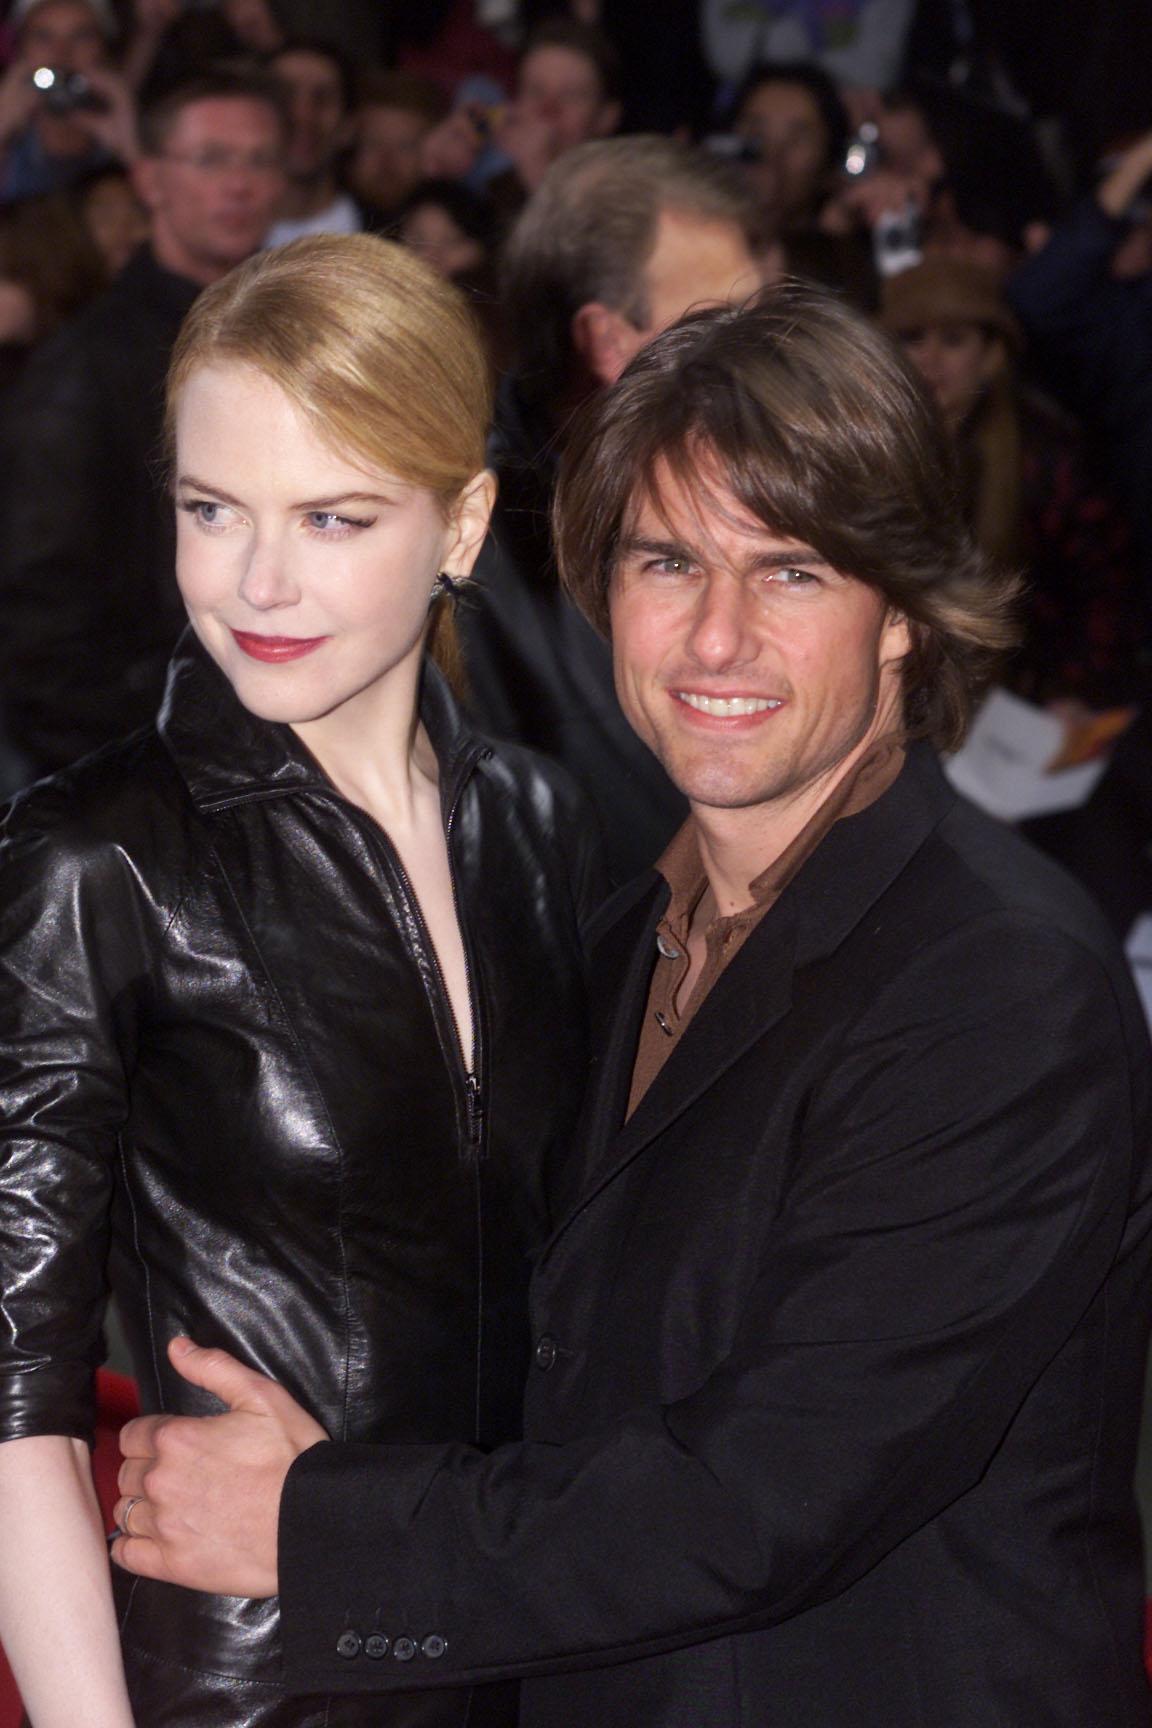 Nicole Kidman y Tom Cruise, rupturas